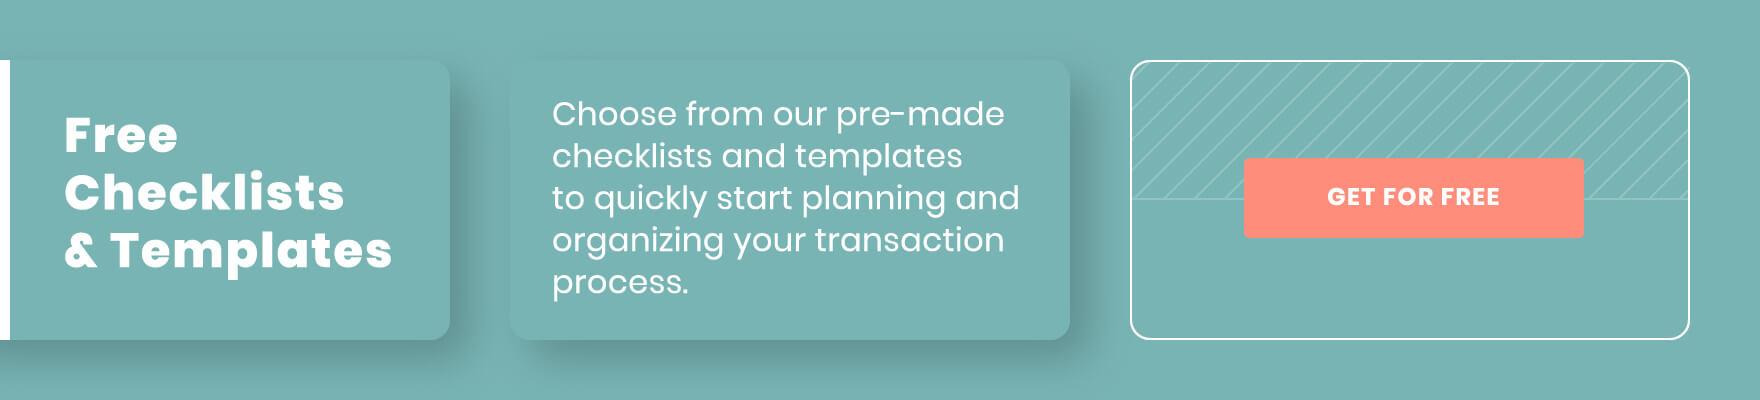 free checklists & templates